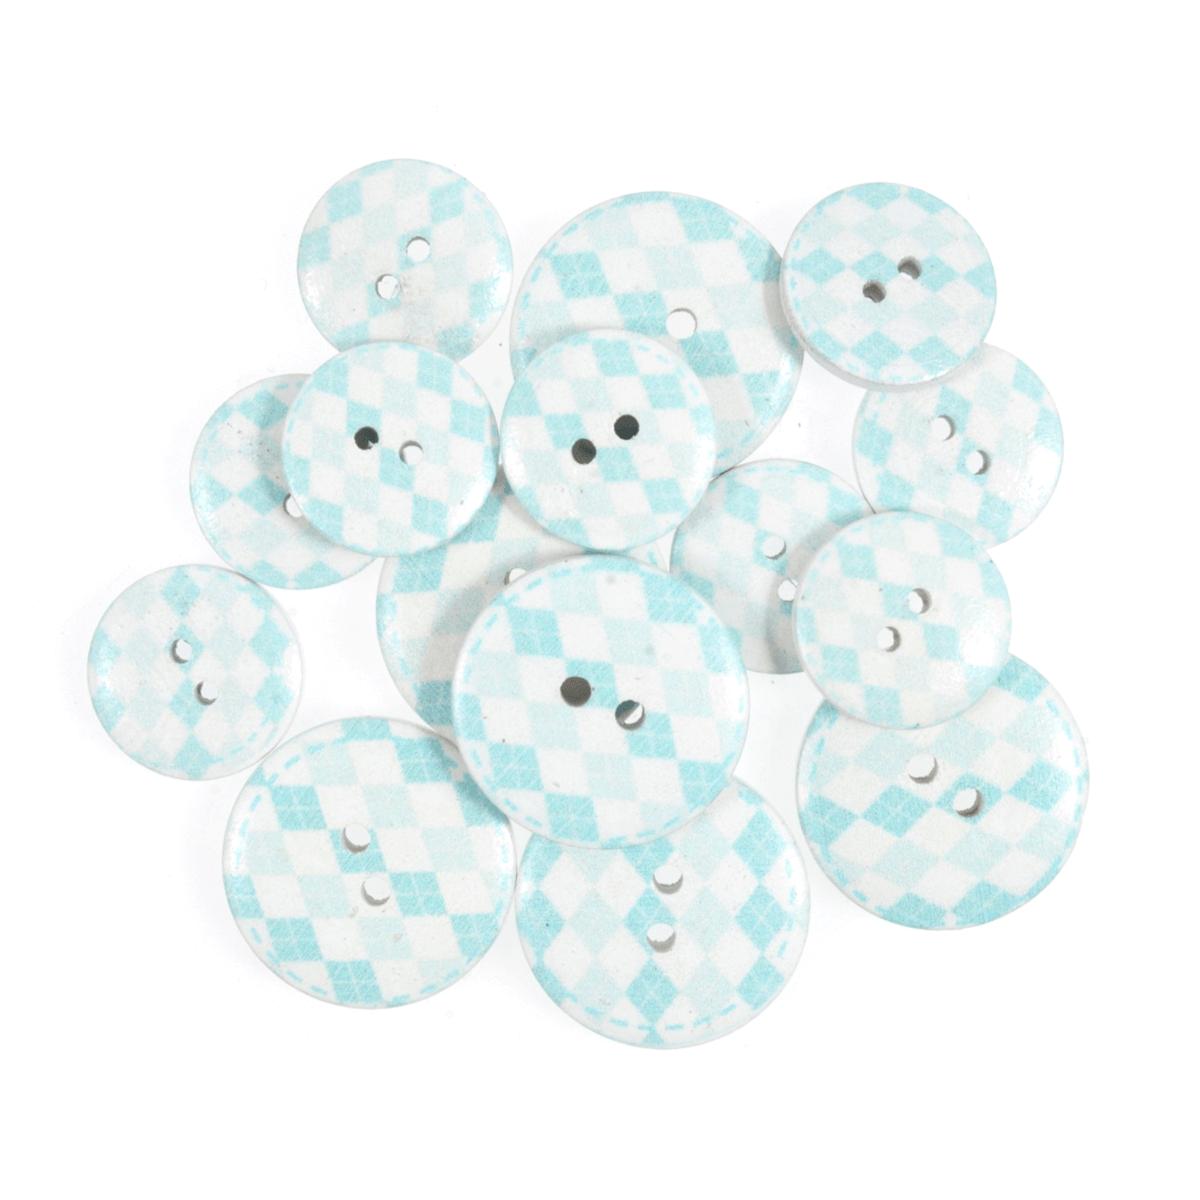 15 x Assorted Diamond Stripe Wooden Craft Buttons 18mm - 25mm